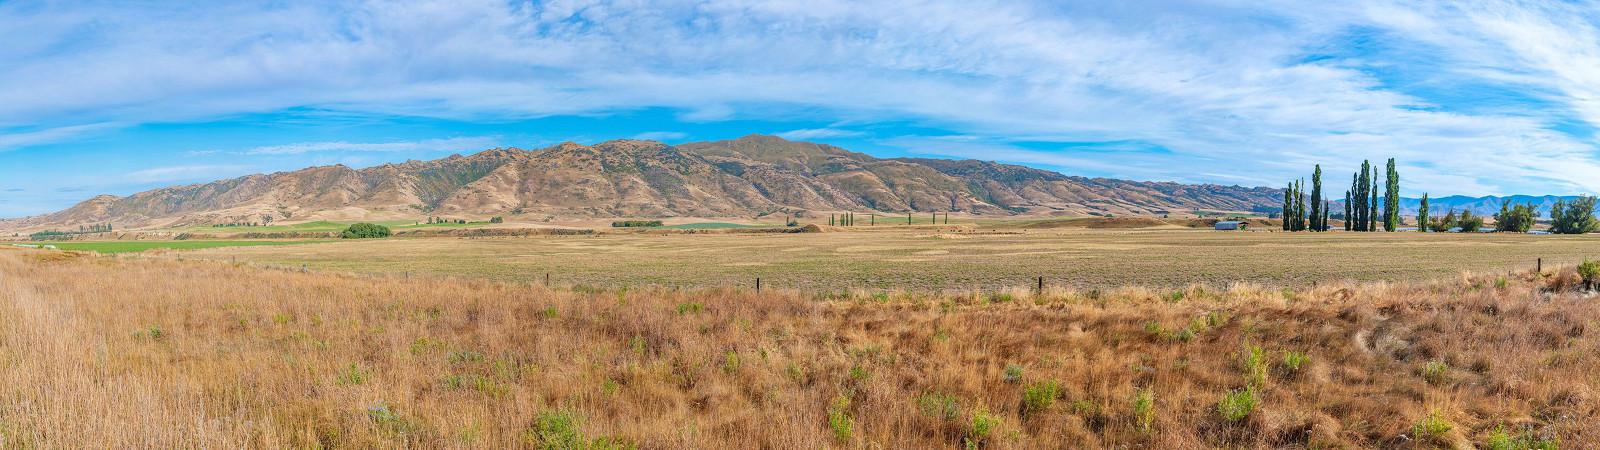 Otago landscape New Zealand - The Wooden Box